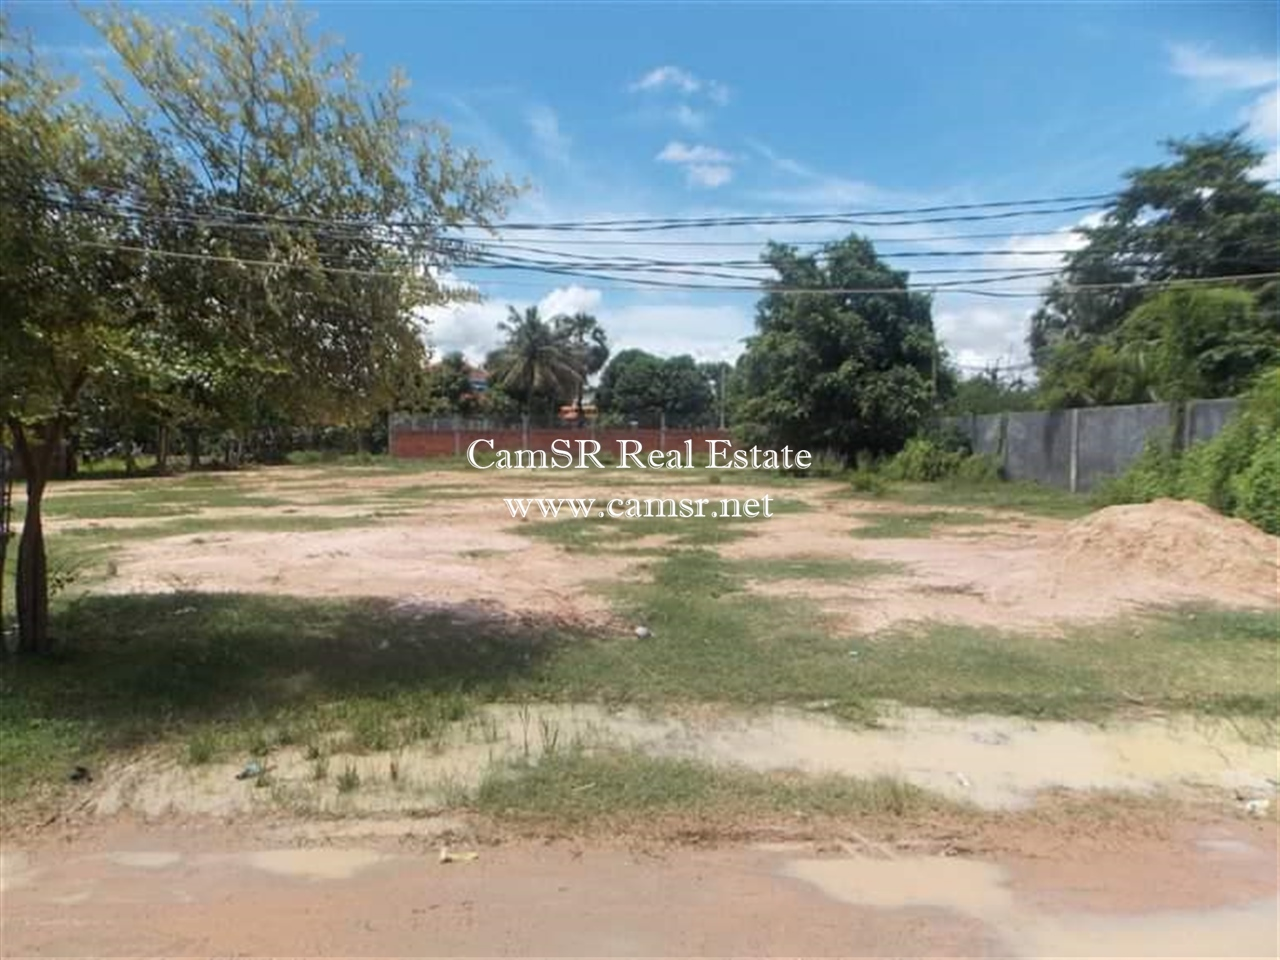 Land For Sale in Siem Reap-Svay Dangkum